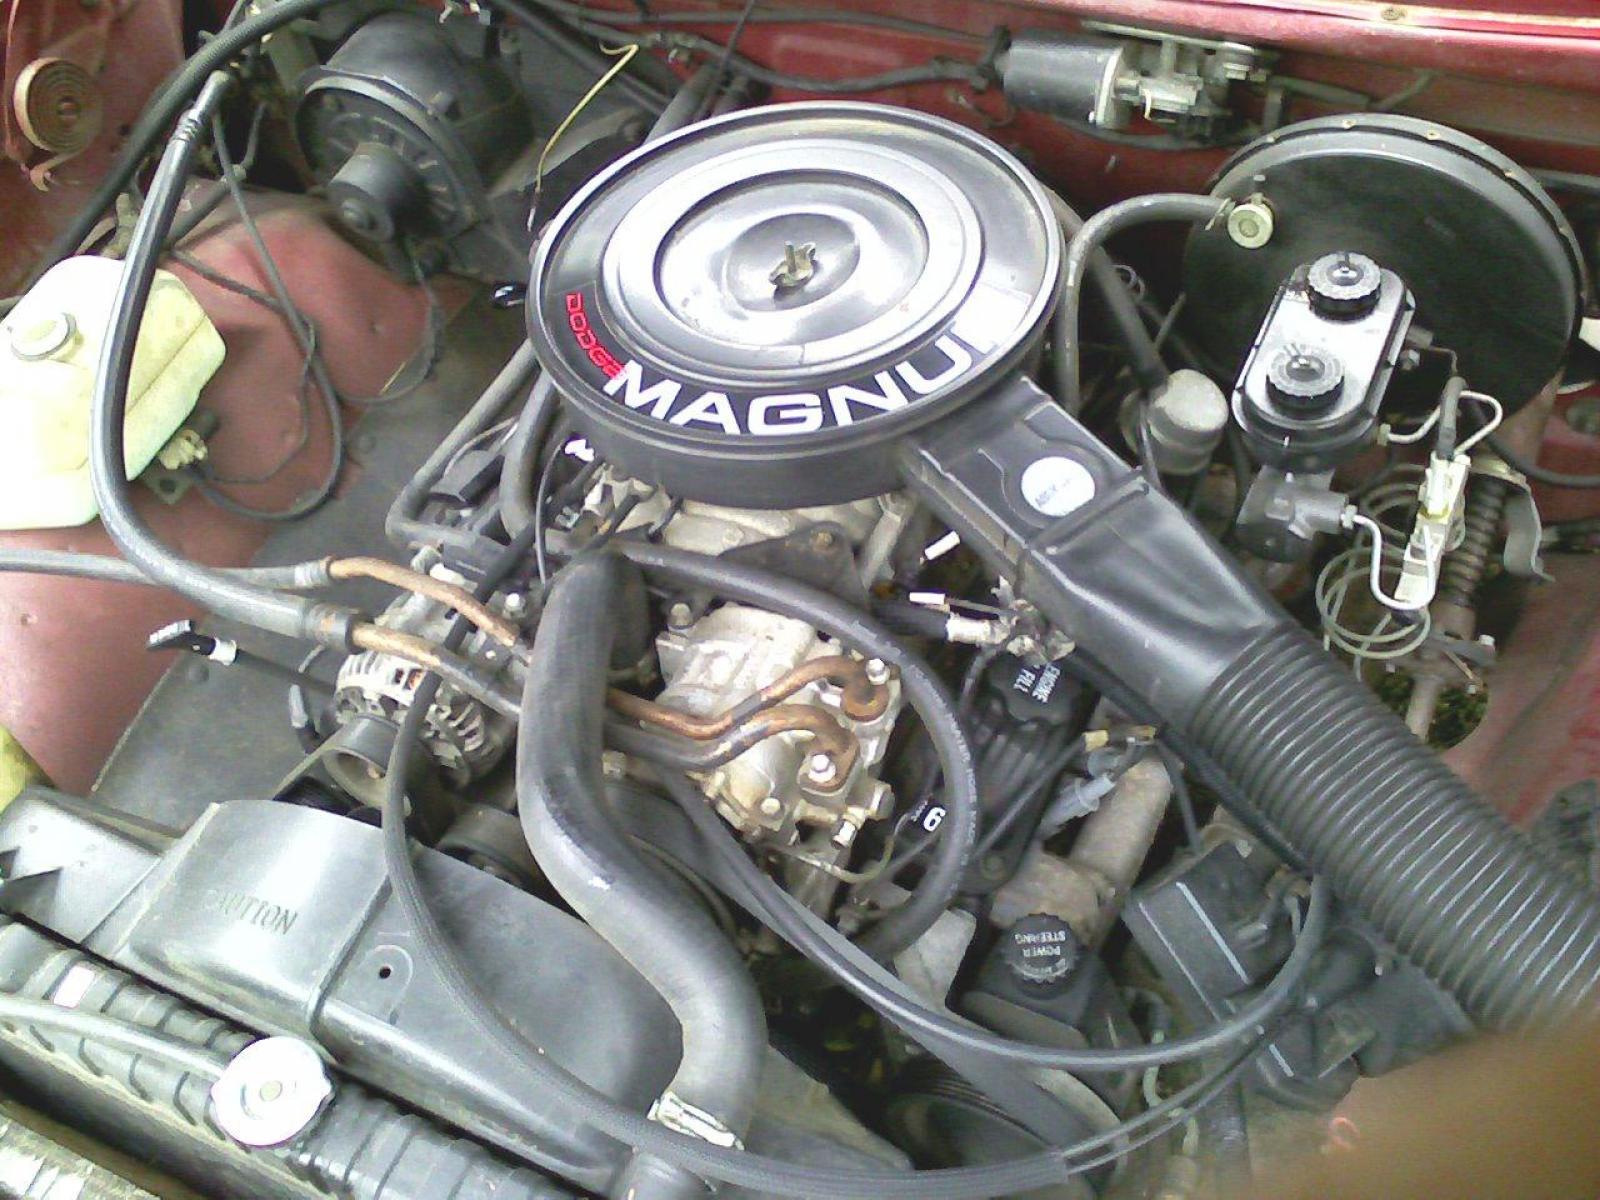 1992 Dodge Ram 150 Information And Photos Zombiedrive 1990 Spirit Wiring Diagram 800 1024 1280 1600 Origin